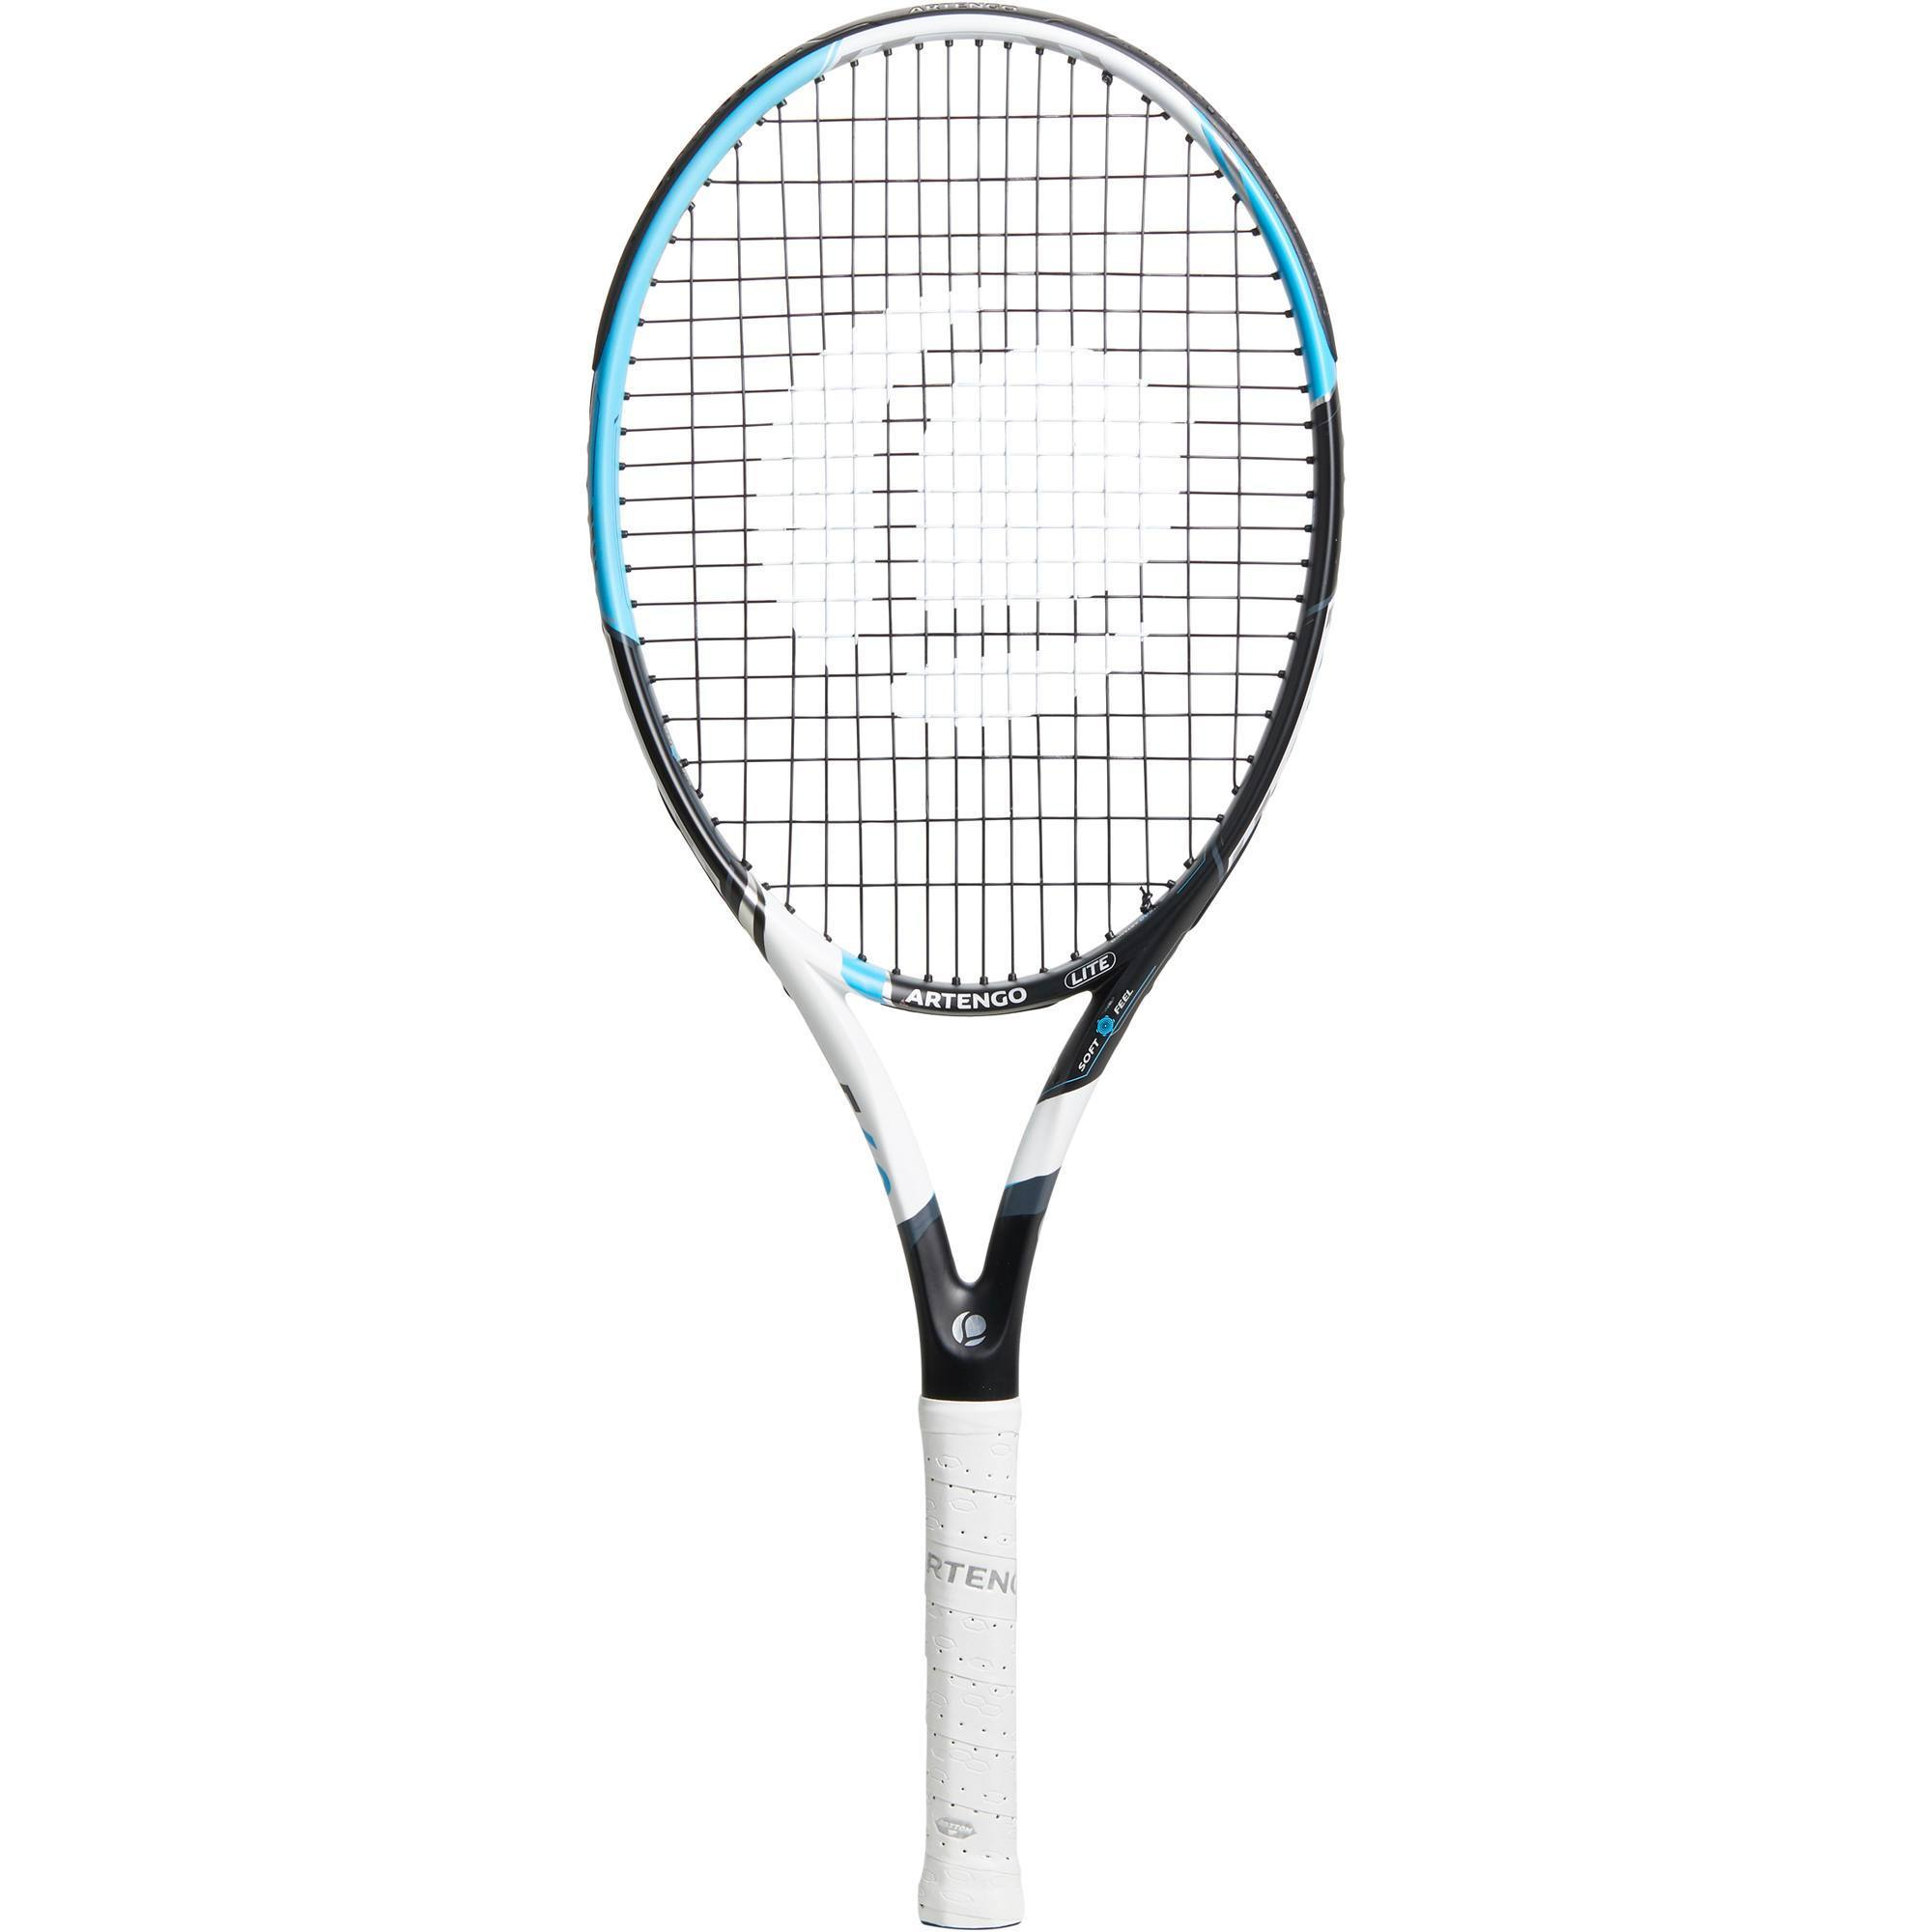 TR560 Lite Adult Tennis Racket - Black/Blue/White   artengo